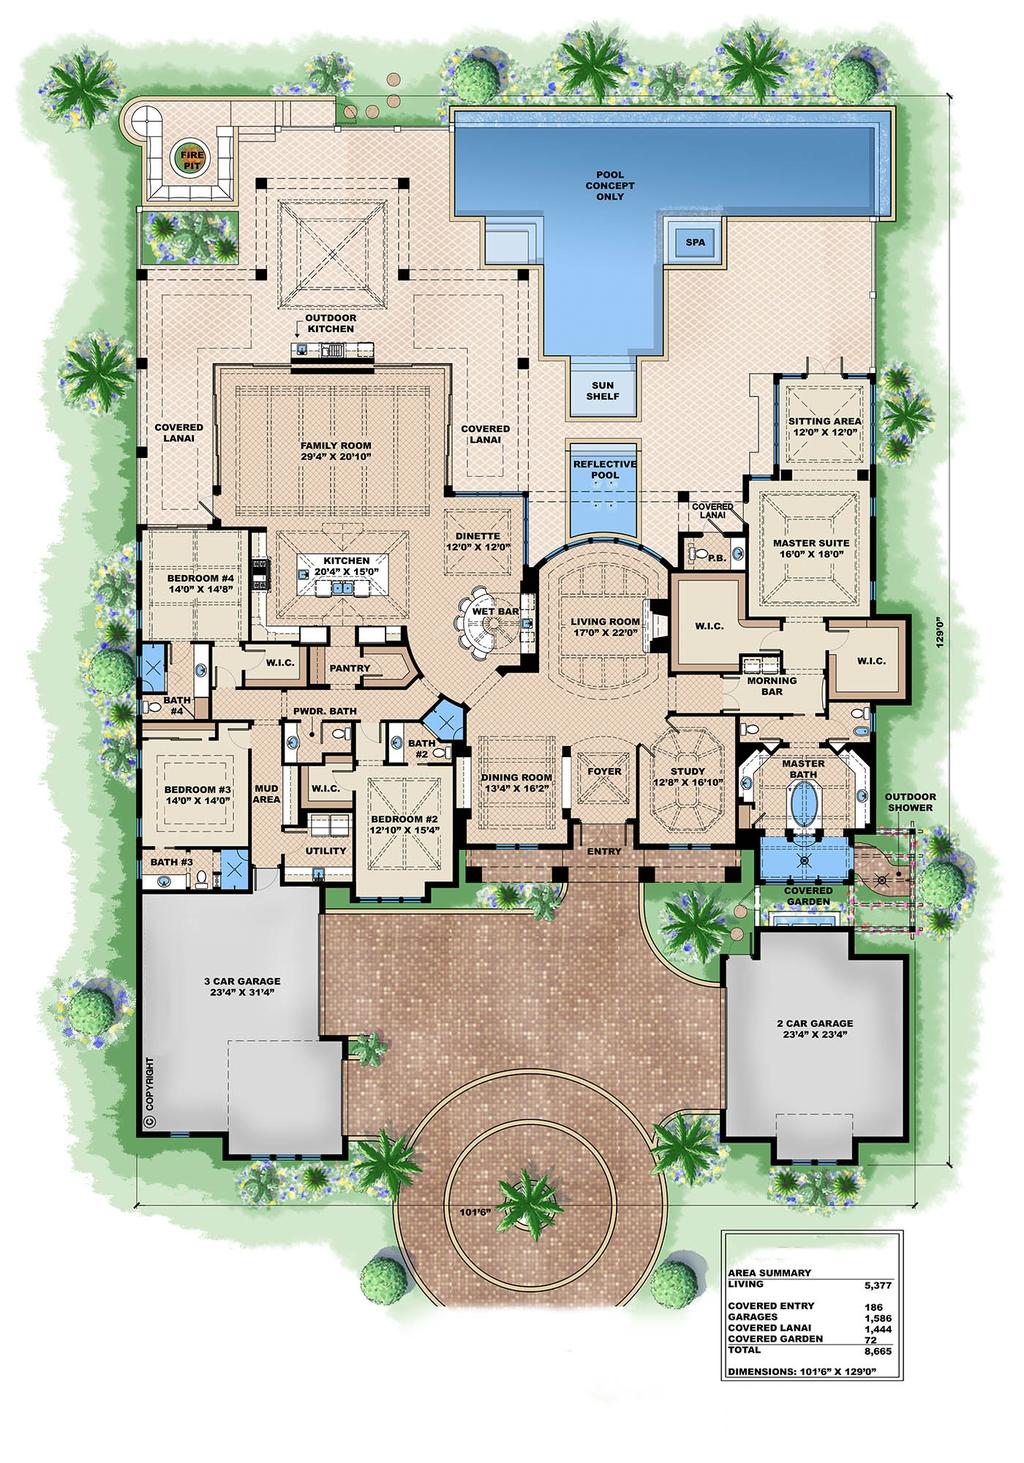 European Style House Plan 4 Beds 4 75 Baths 5377 Sq Ft Plan 27 455 Dream House Plans House Plans House Floor Plans